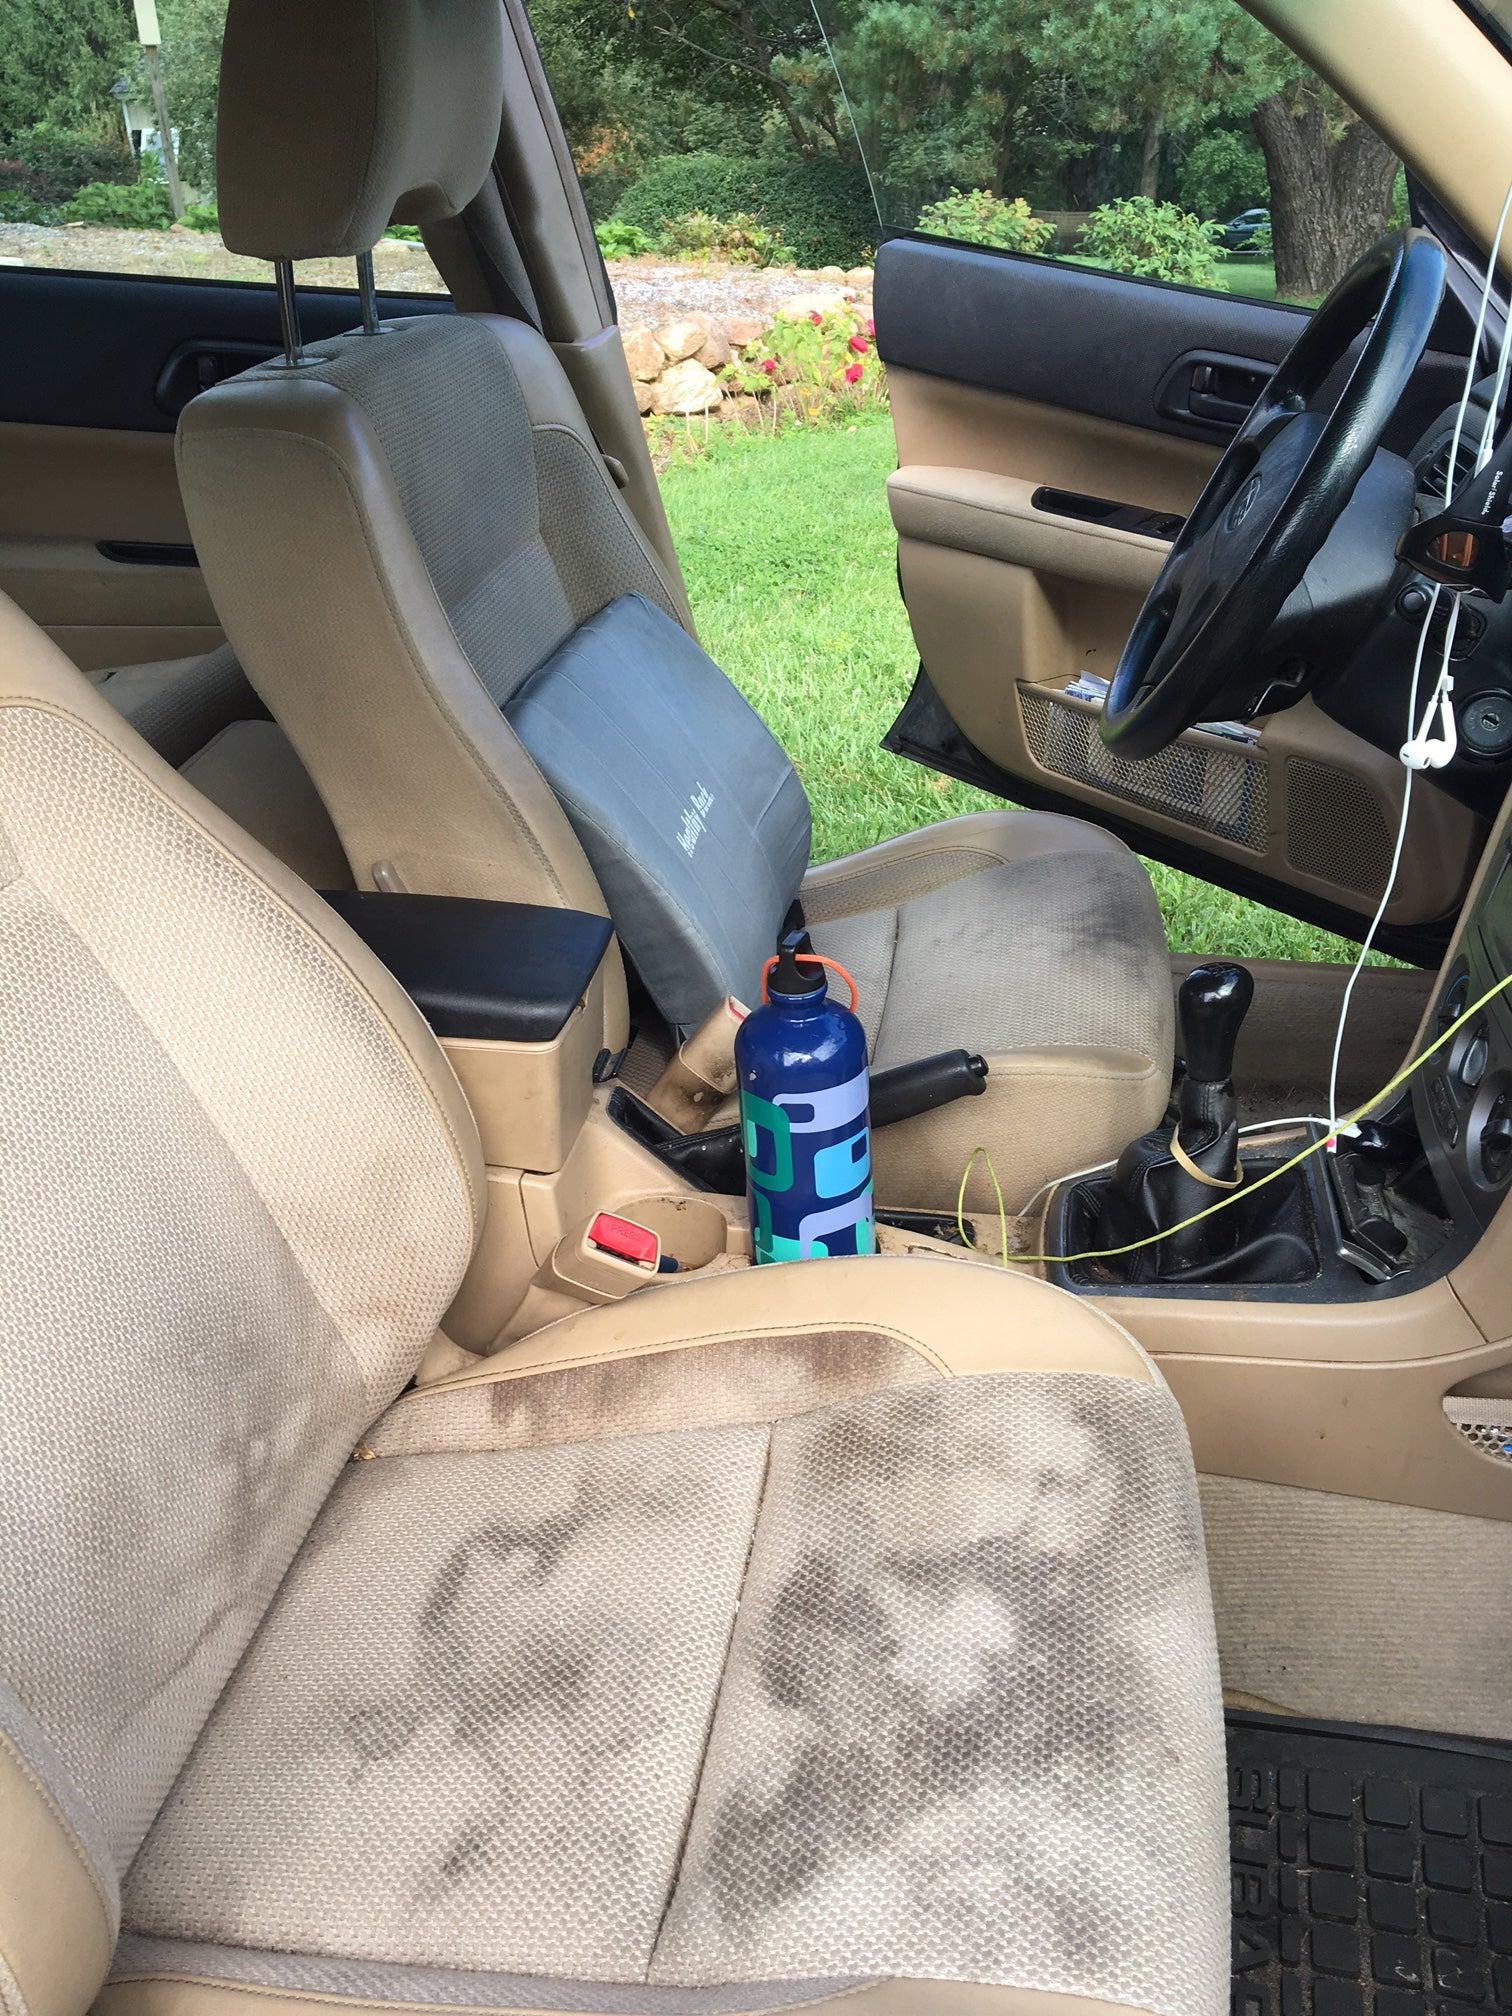 subaru forester; interior car